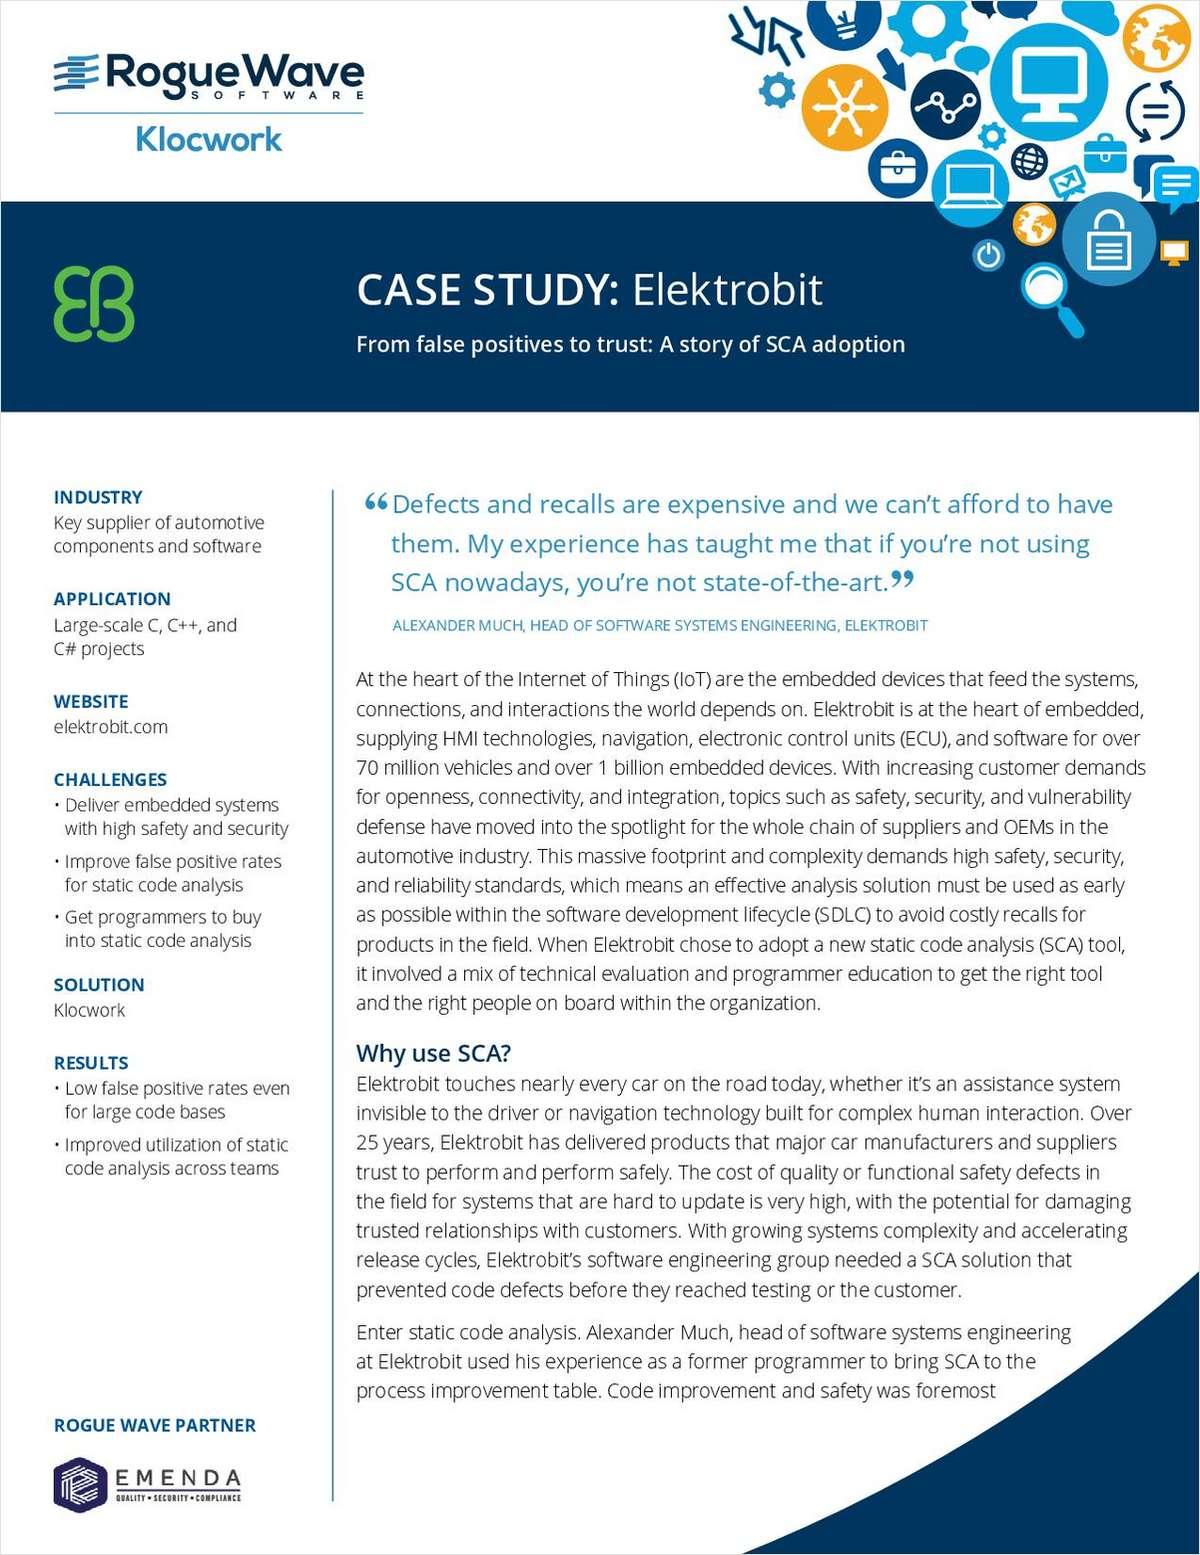 global management case study elektrobit